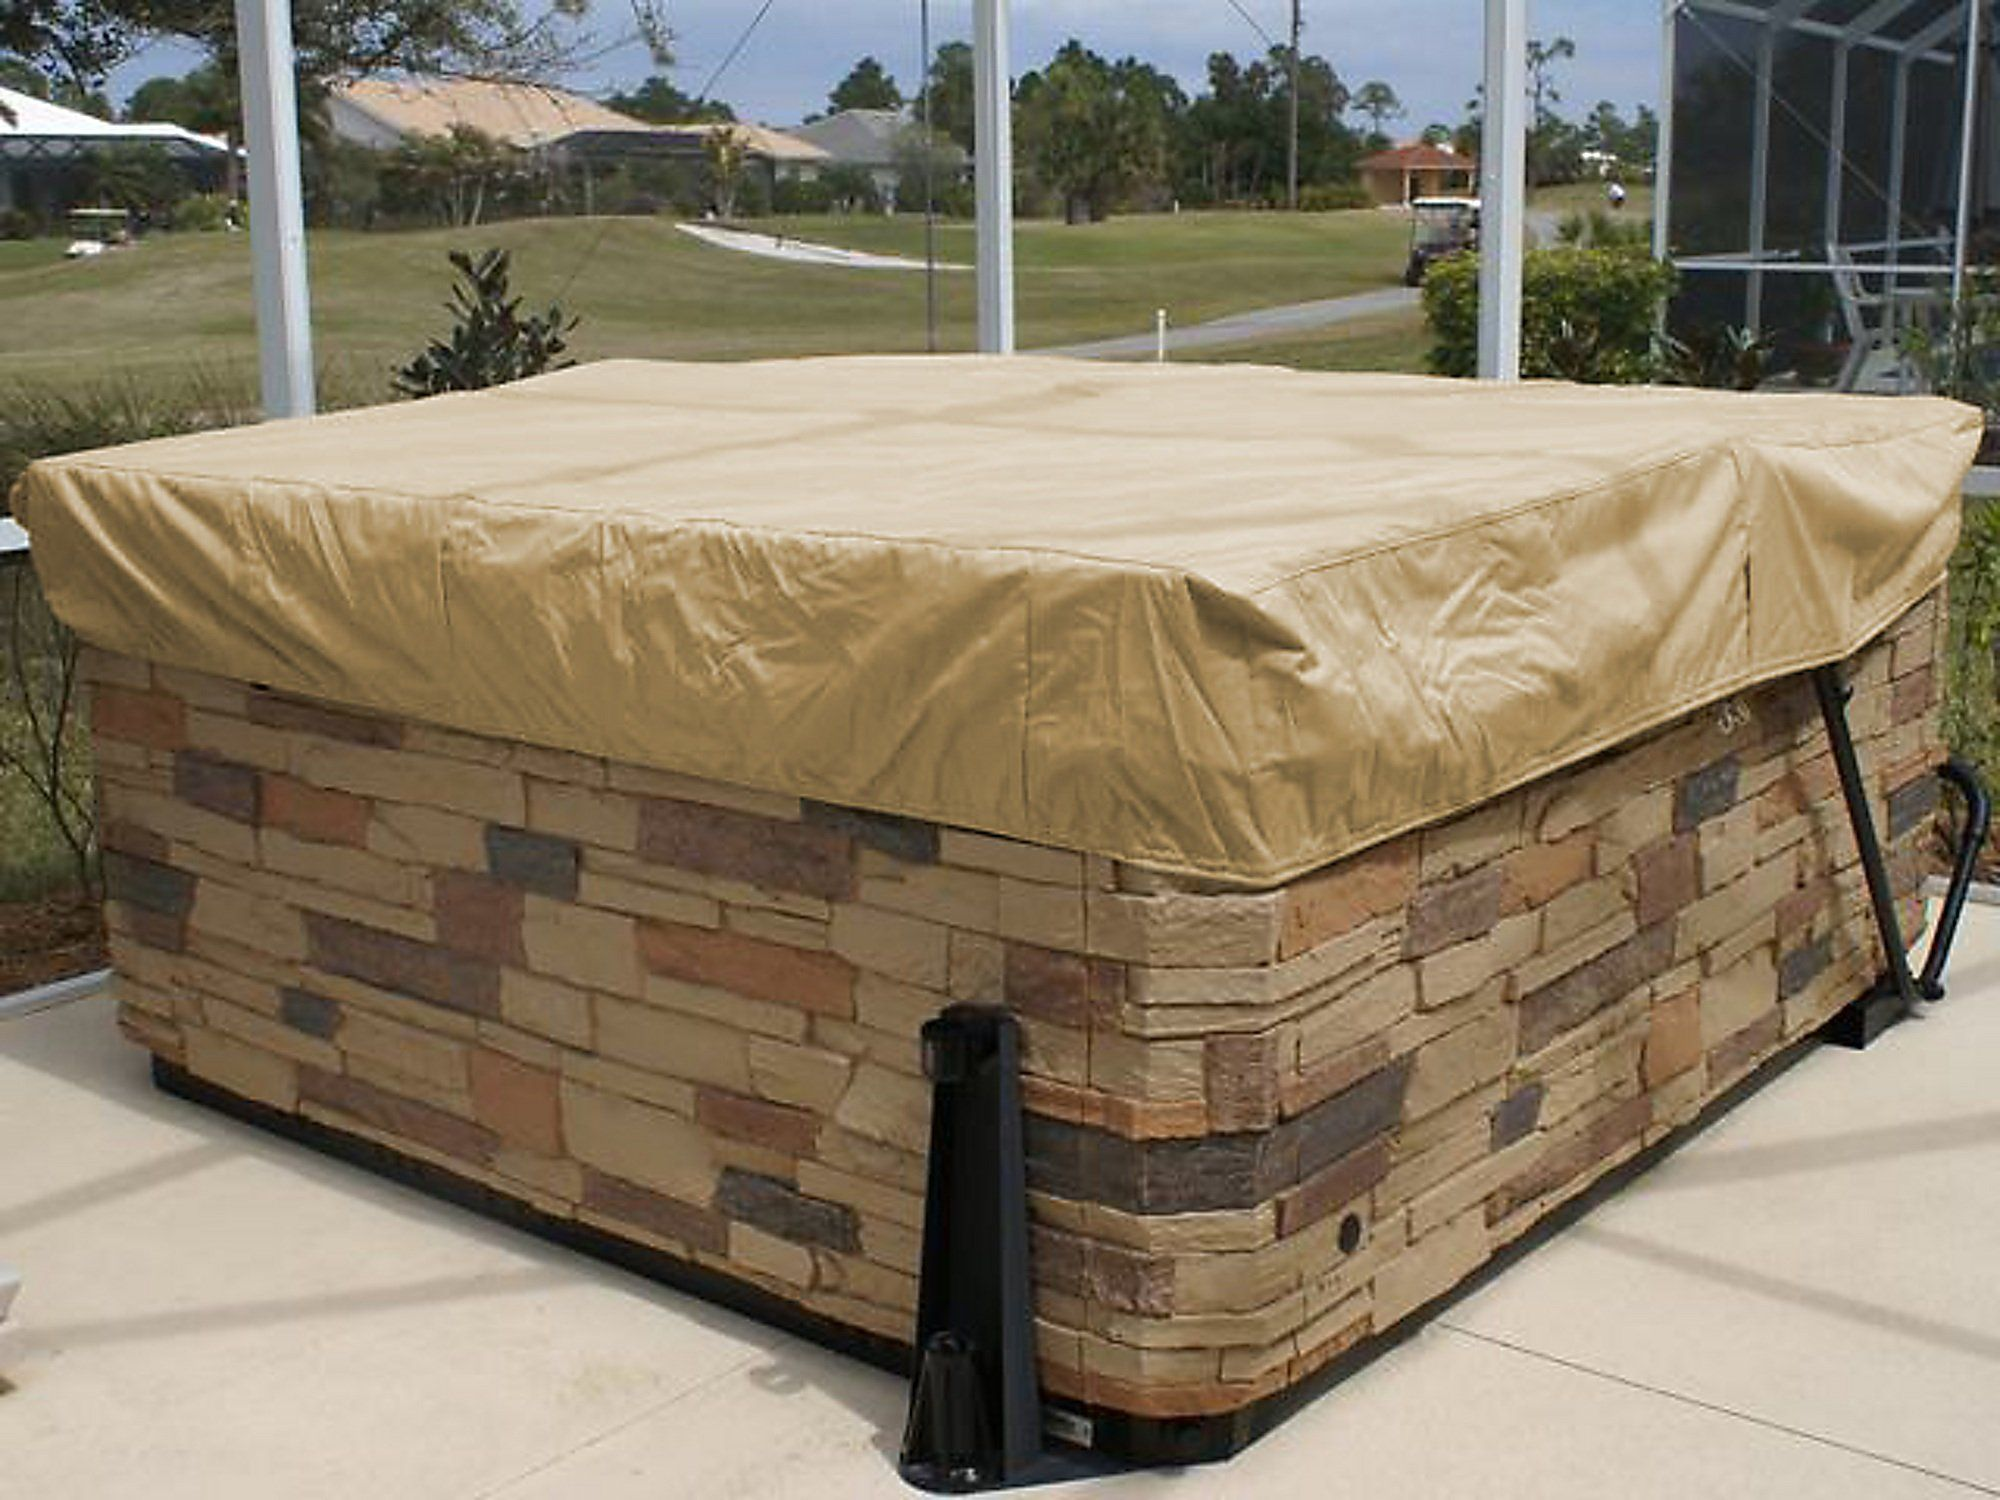 covermates patio furniture covers. Amazon.com : CoverMates Square Hot Tub Cover - Cap 92W X 92D 14H · CoverPatio Furniture Covermates Patio Covers C